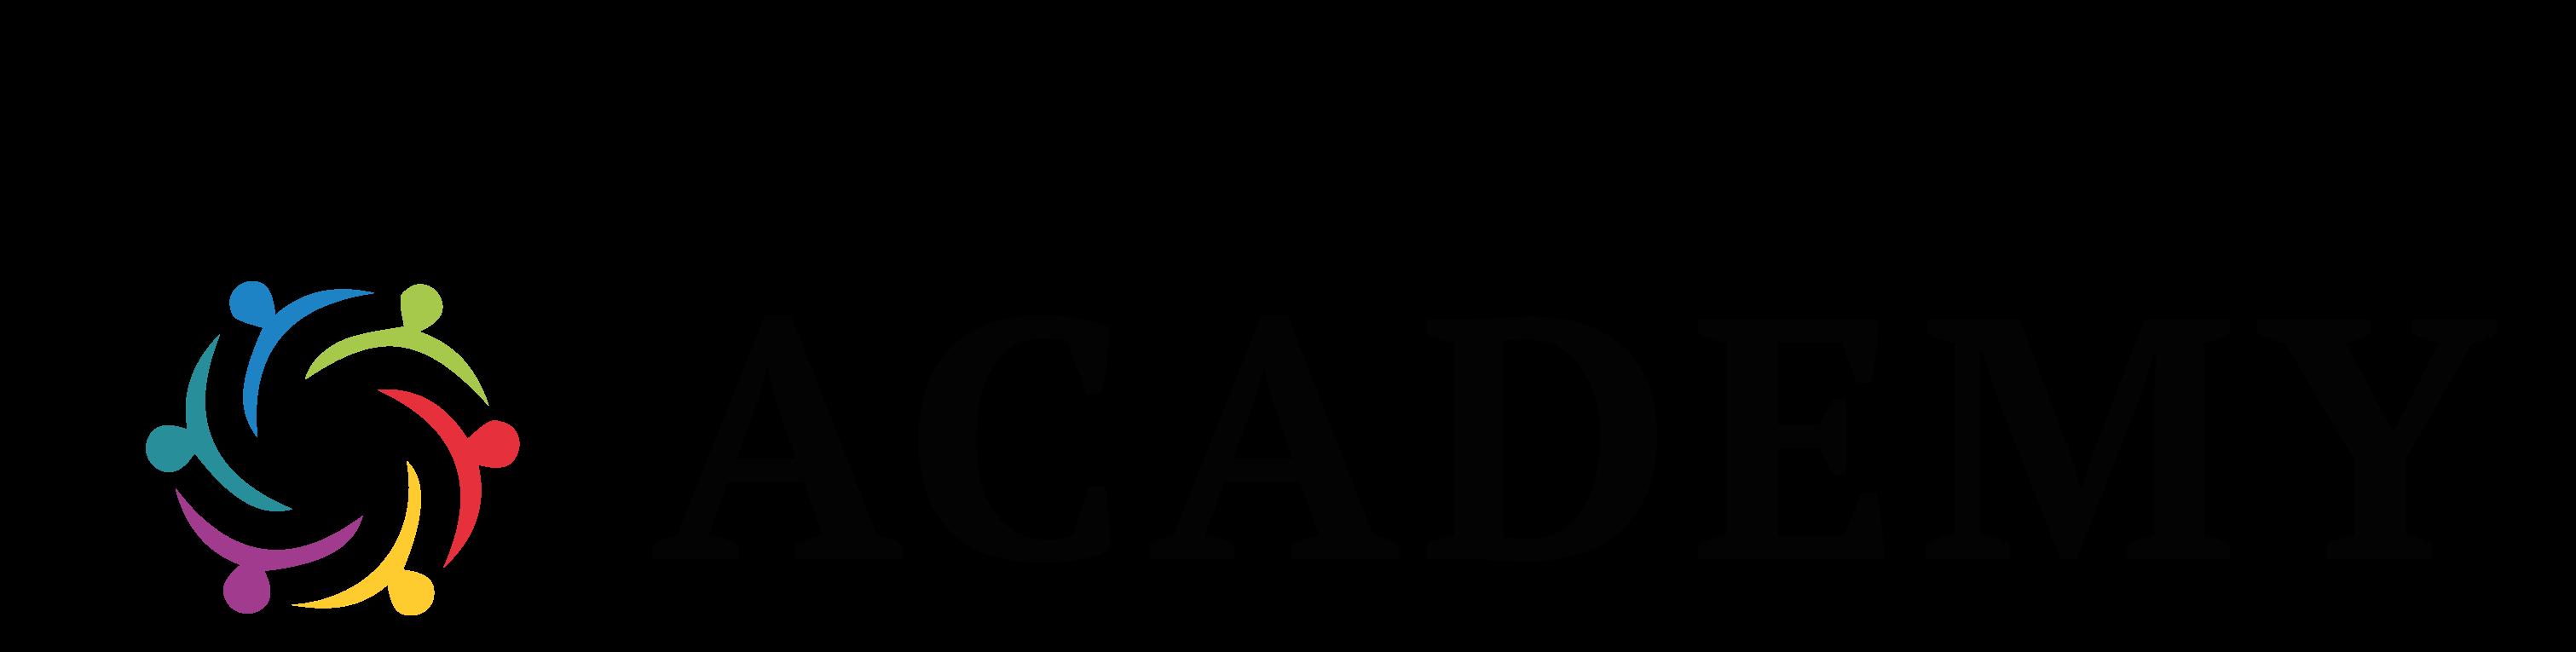 Think Academy logo